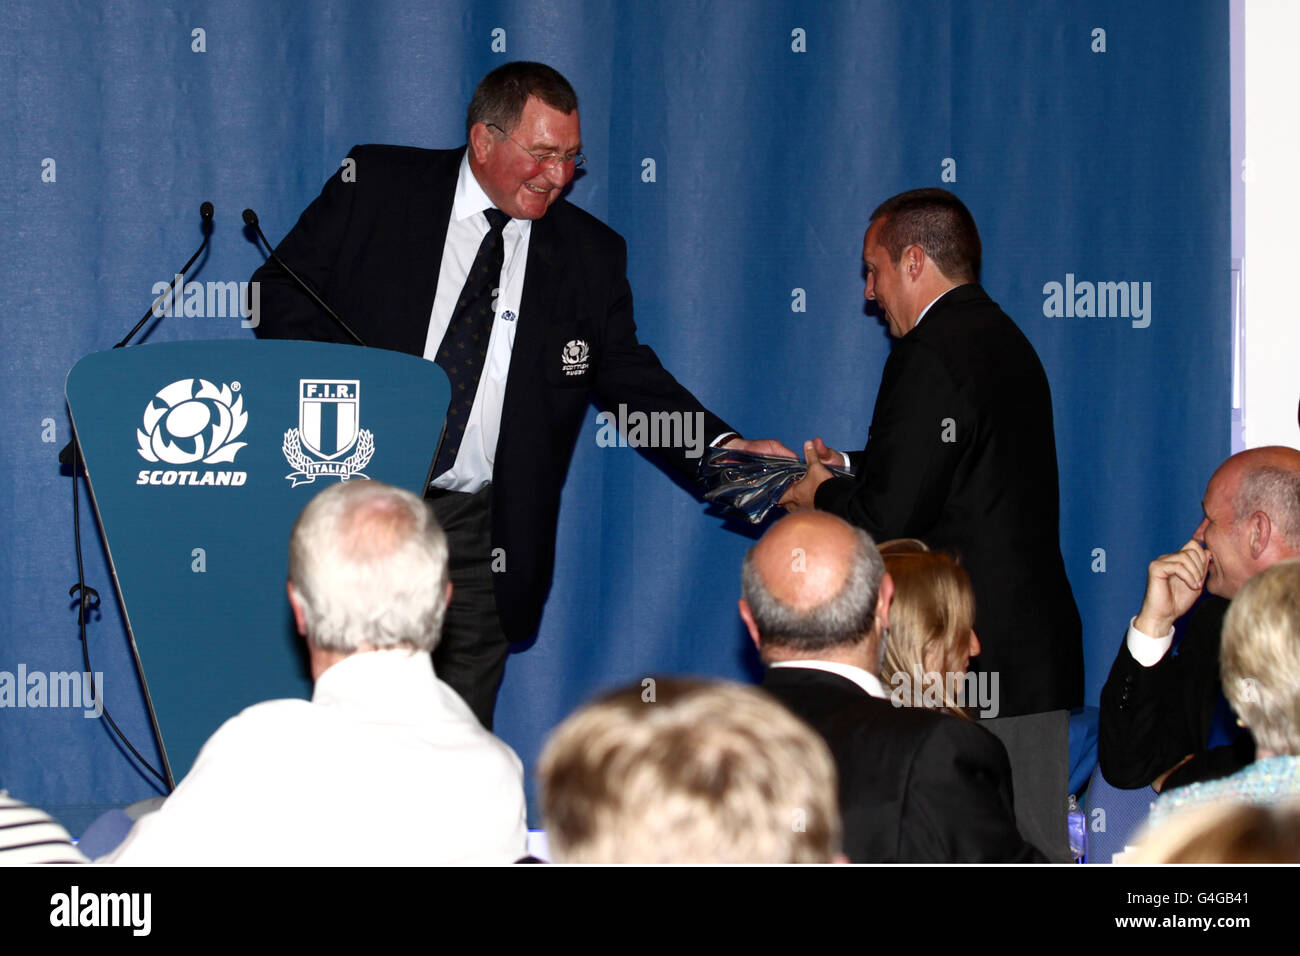 Rugby Union - EMC Test Match - Scotland v Italy - Murrayfield - Stock Image